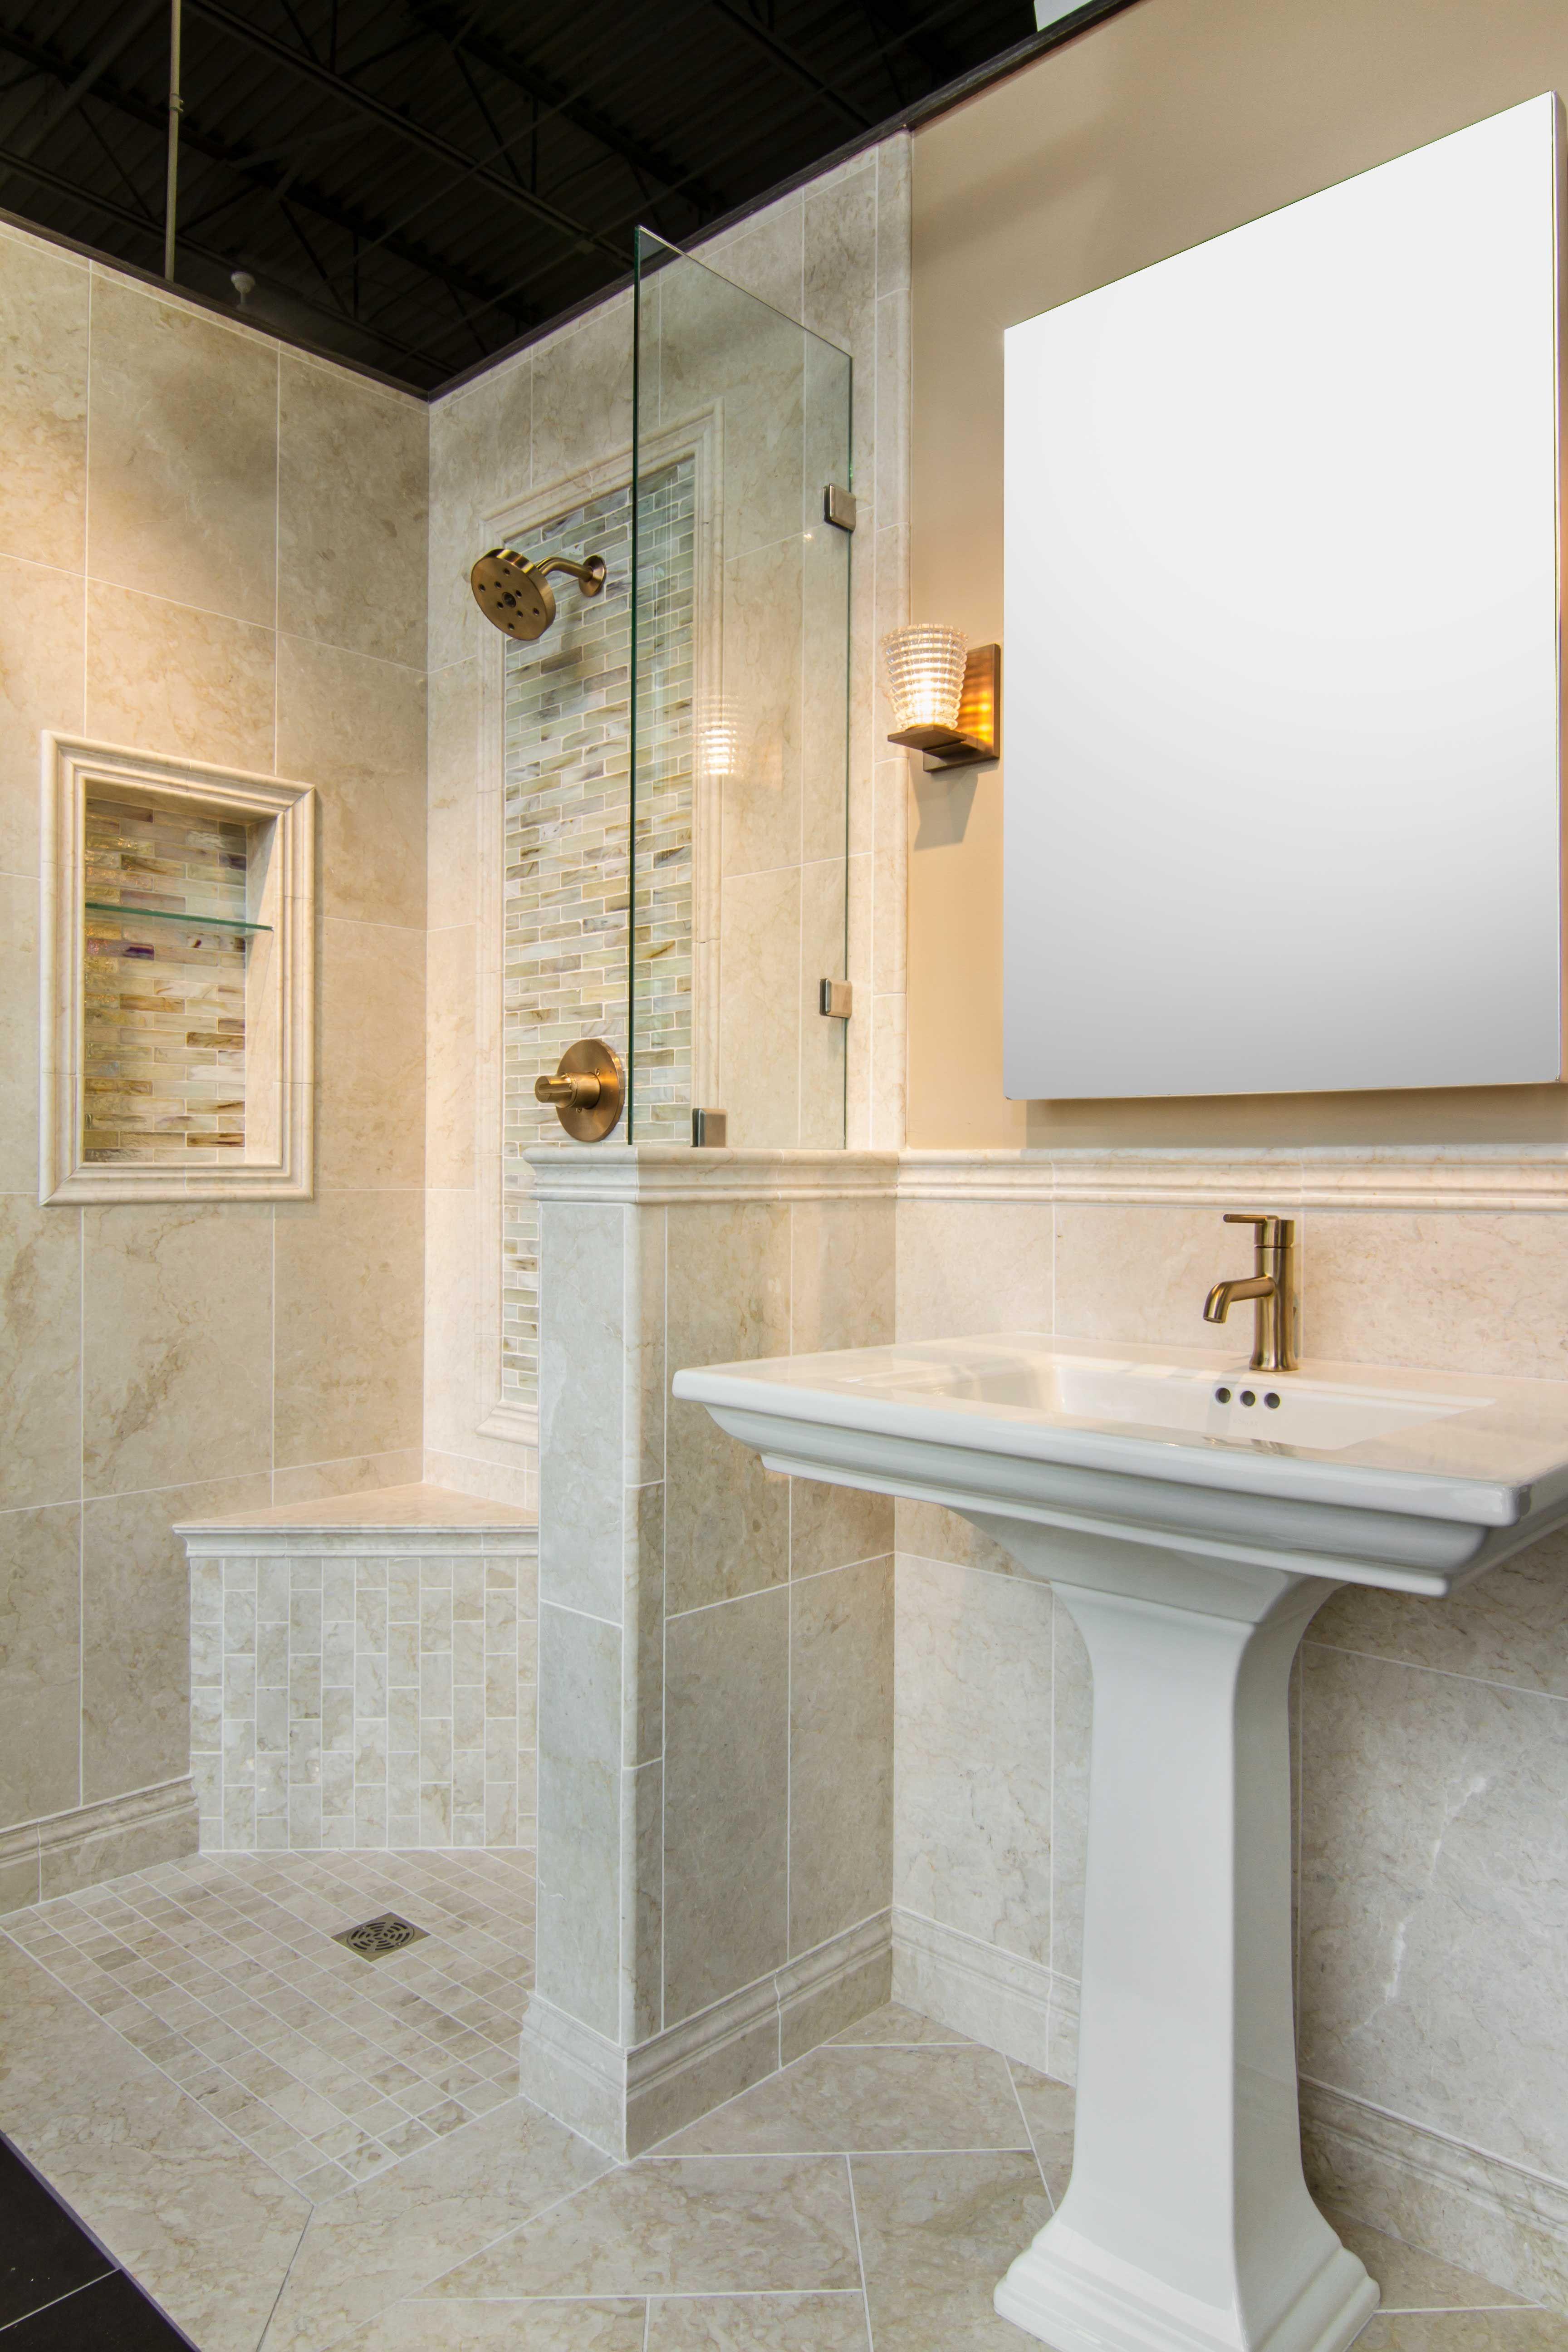 Cream Bathroom Tile Avoria Fiorito Polished Marble Floor Tile Https Www